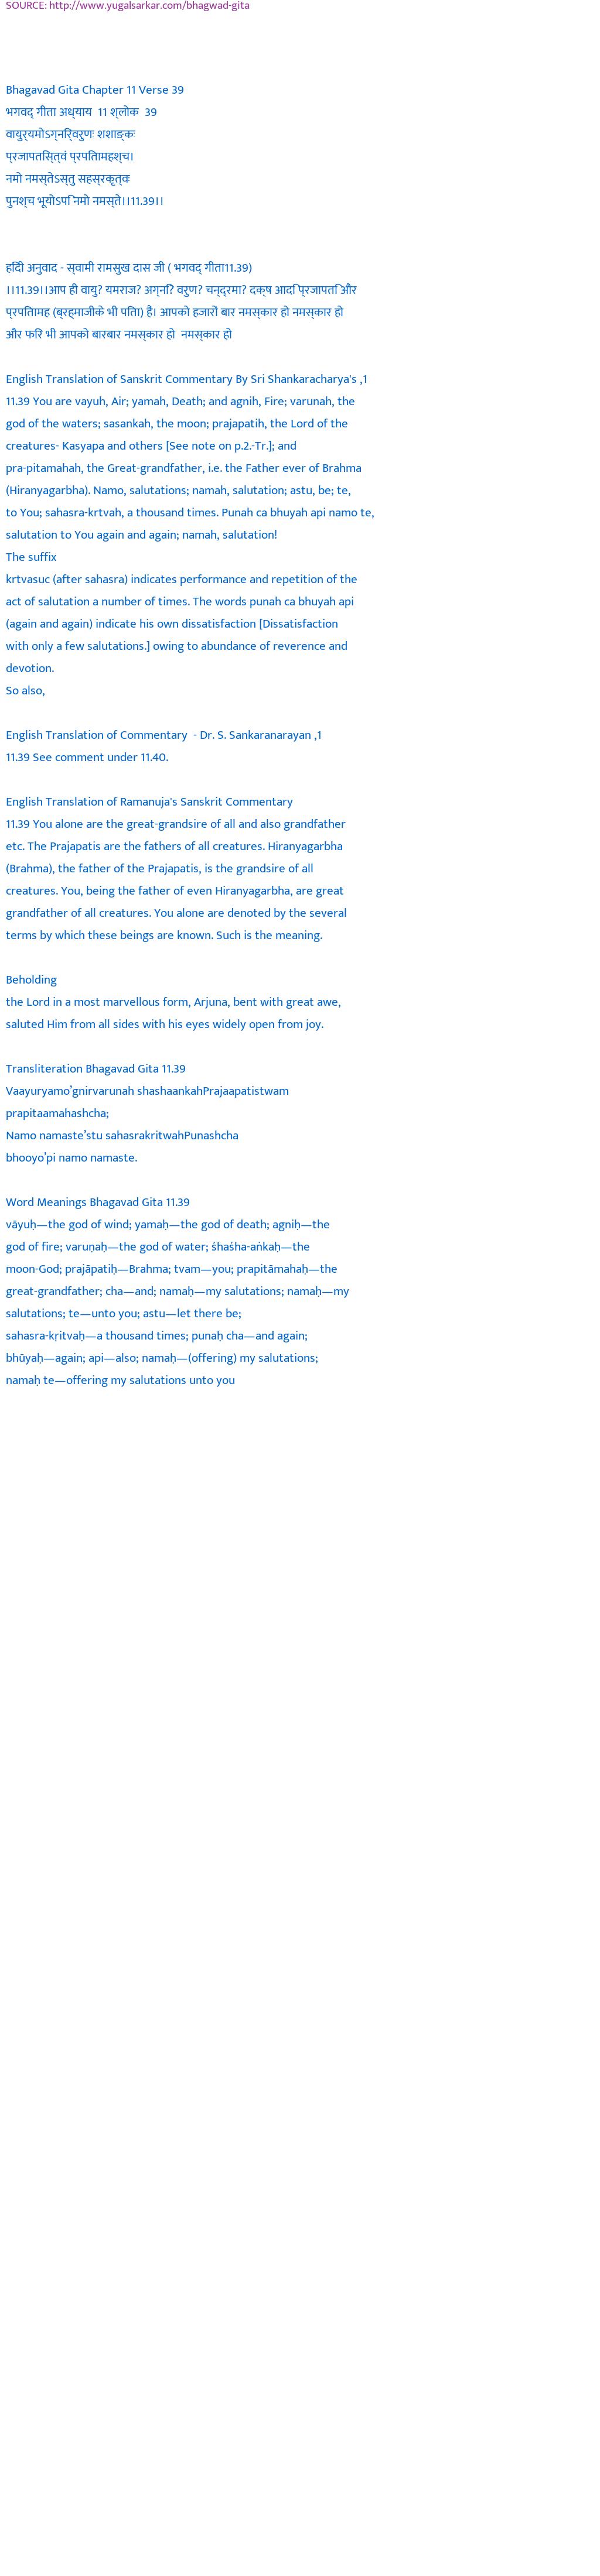 Bhagavad Gita Sanskrit Translation Chapter 11 Verse 39 || भगवद्